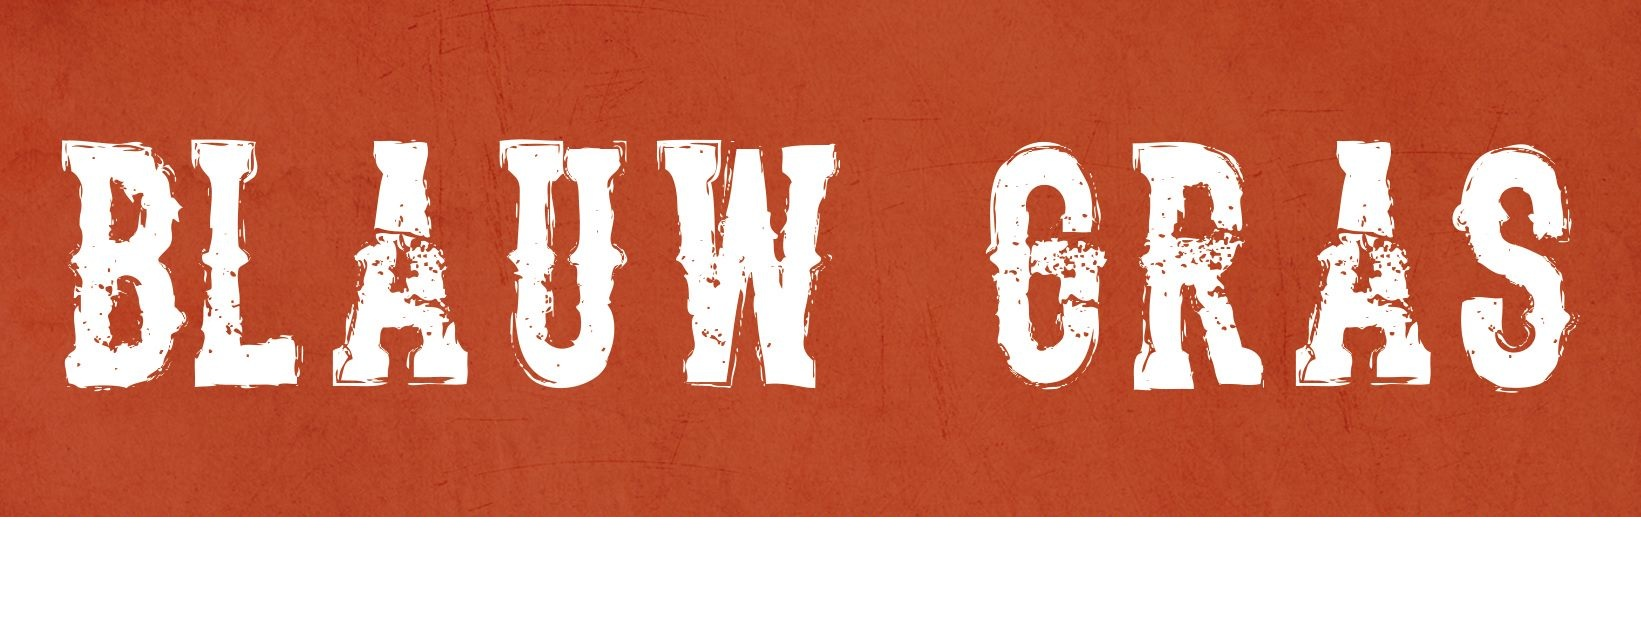 Blauw Gras logo edit